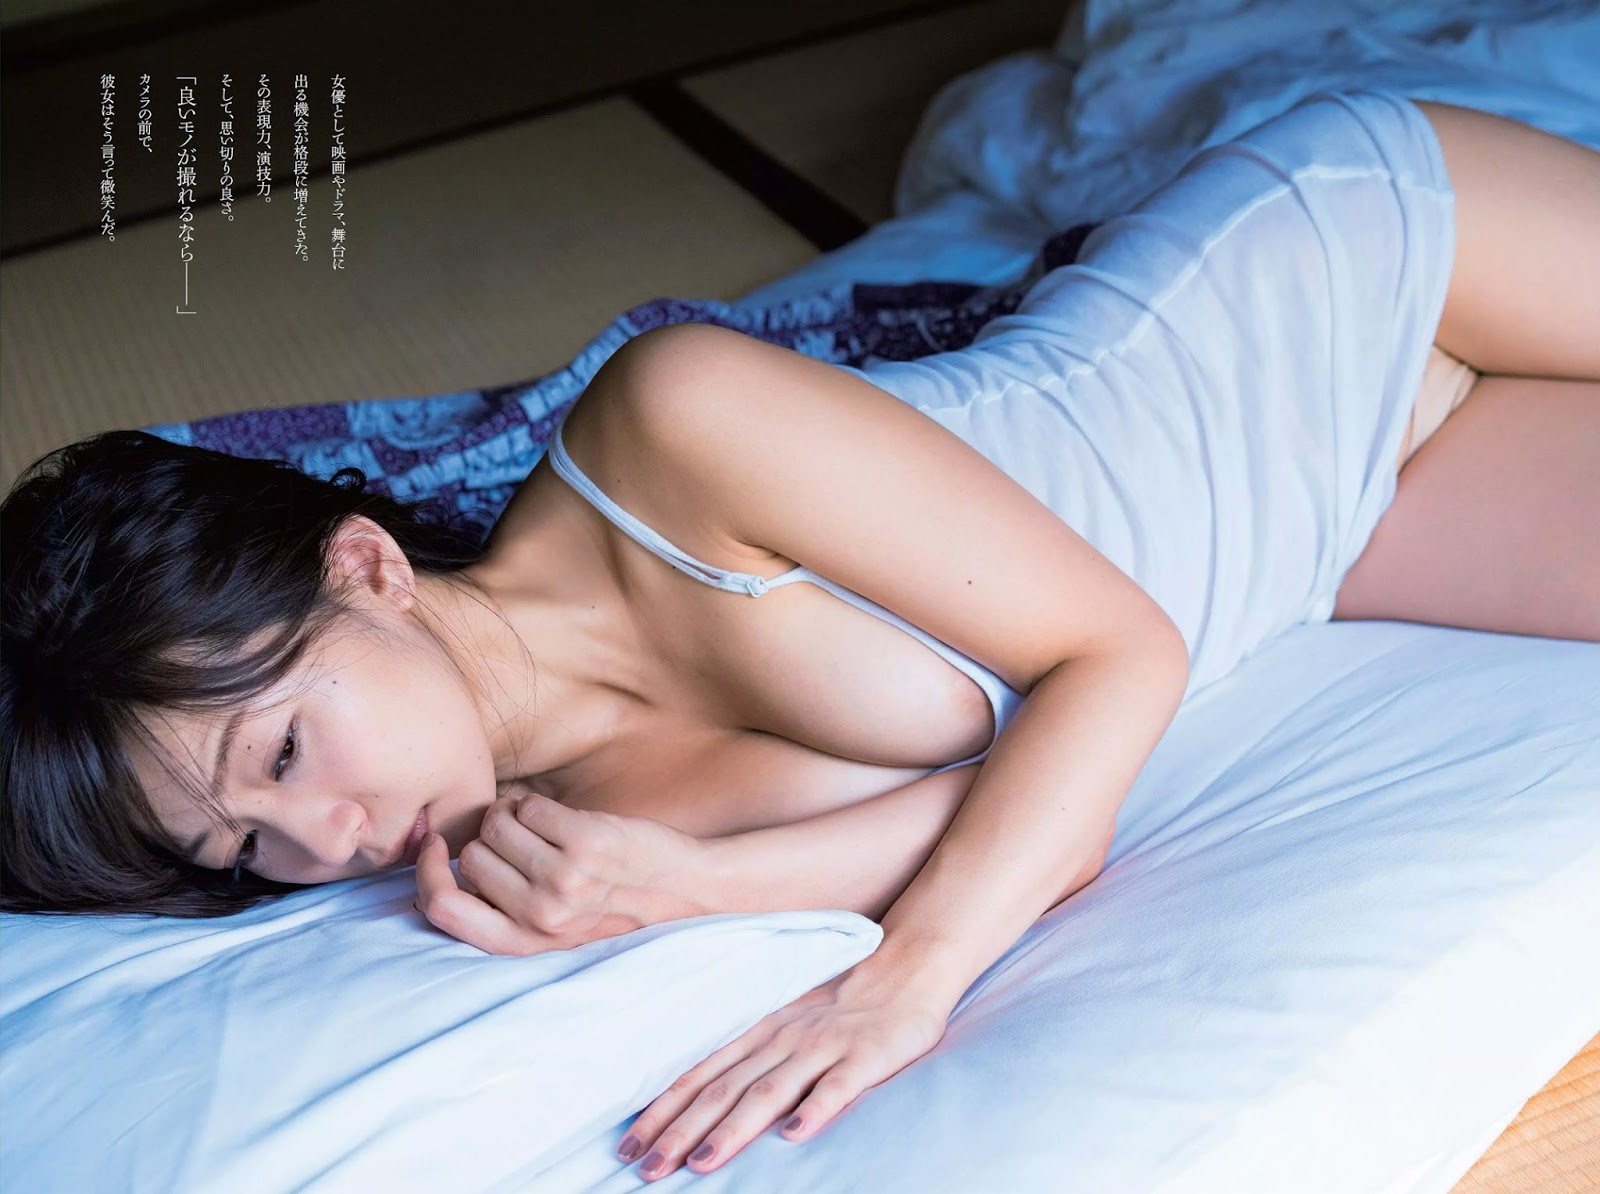 Ruri Shinato 階戸瑠李, Weekly Playboy 2017 No.42 (週刊プレイボーイ 2017年42号)